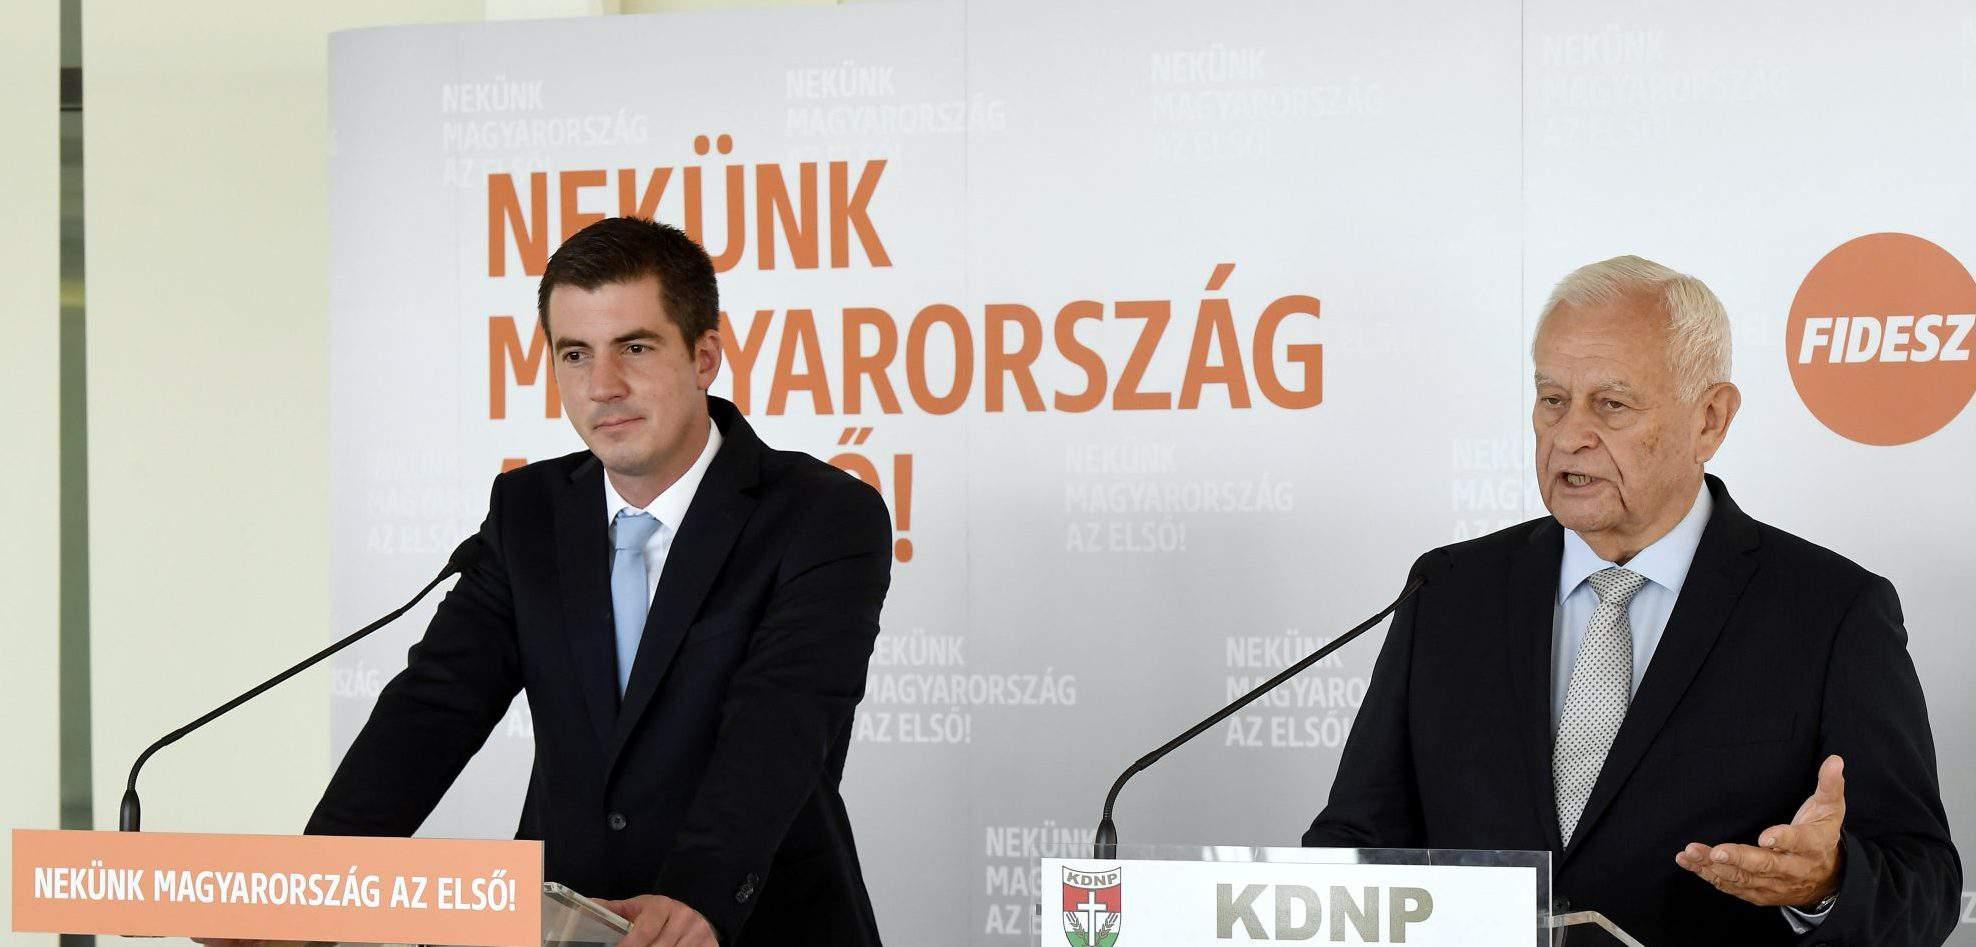 fidesz party